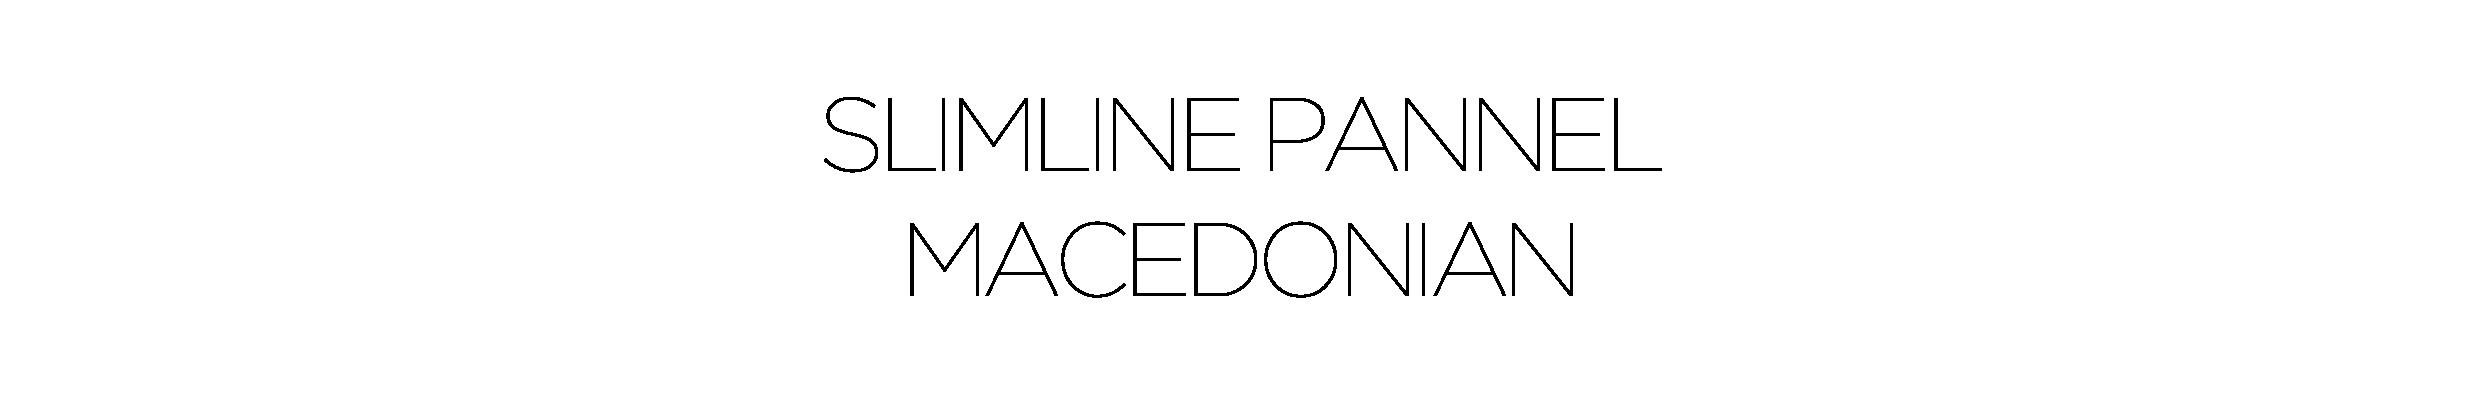 MACEDONIAN-11